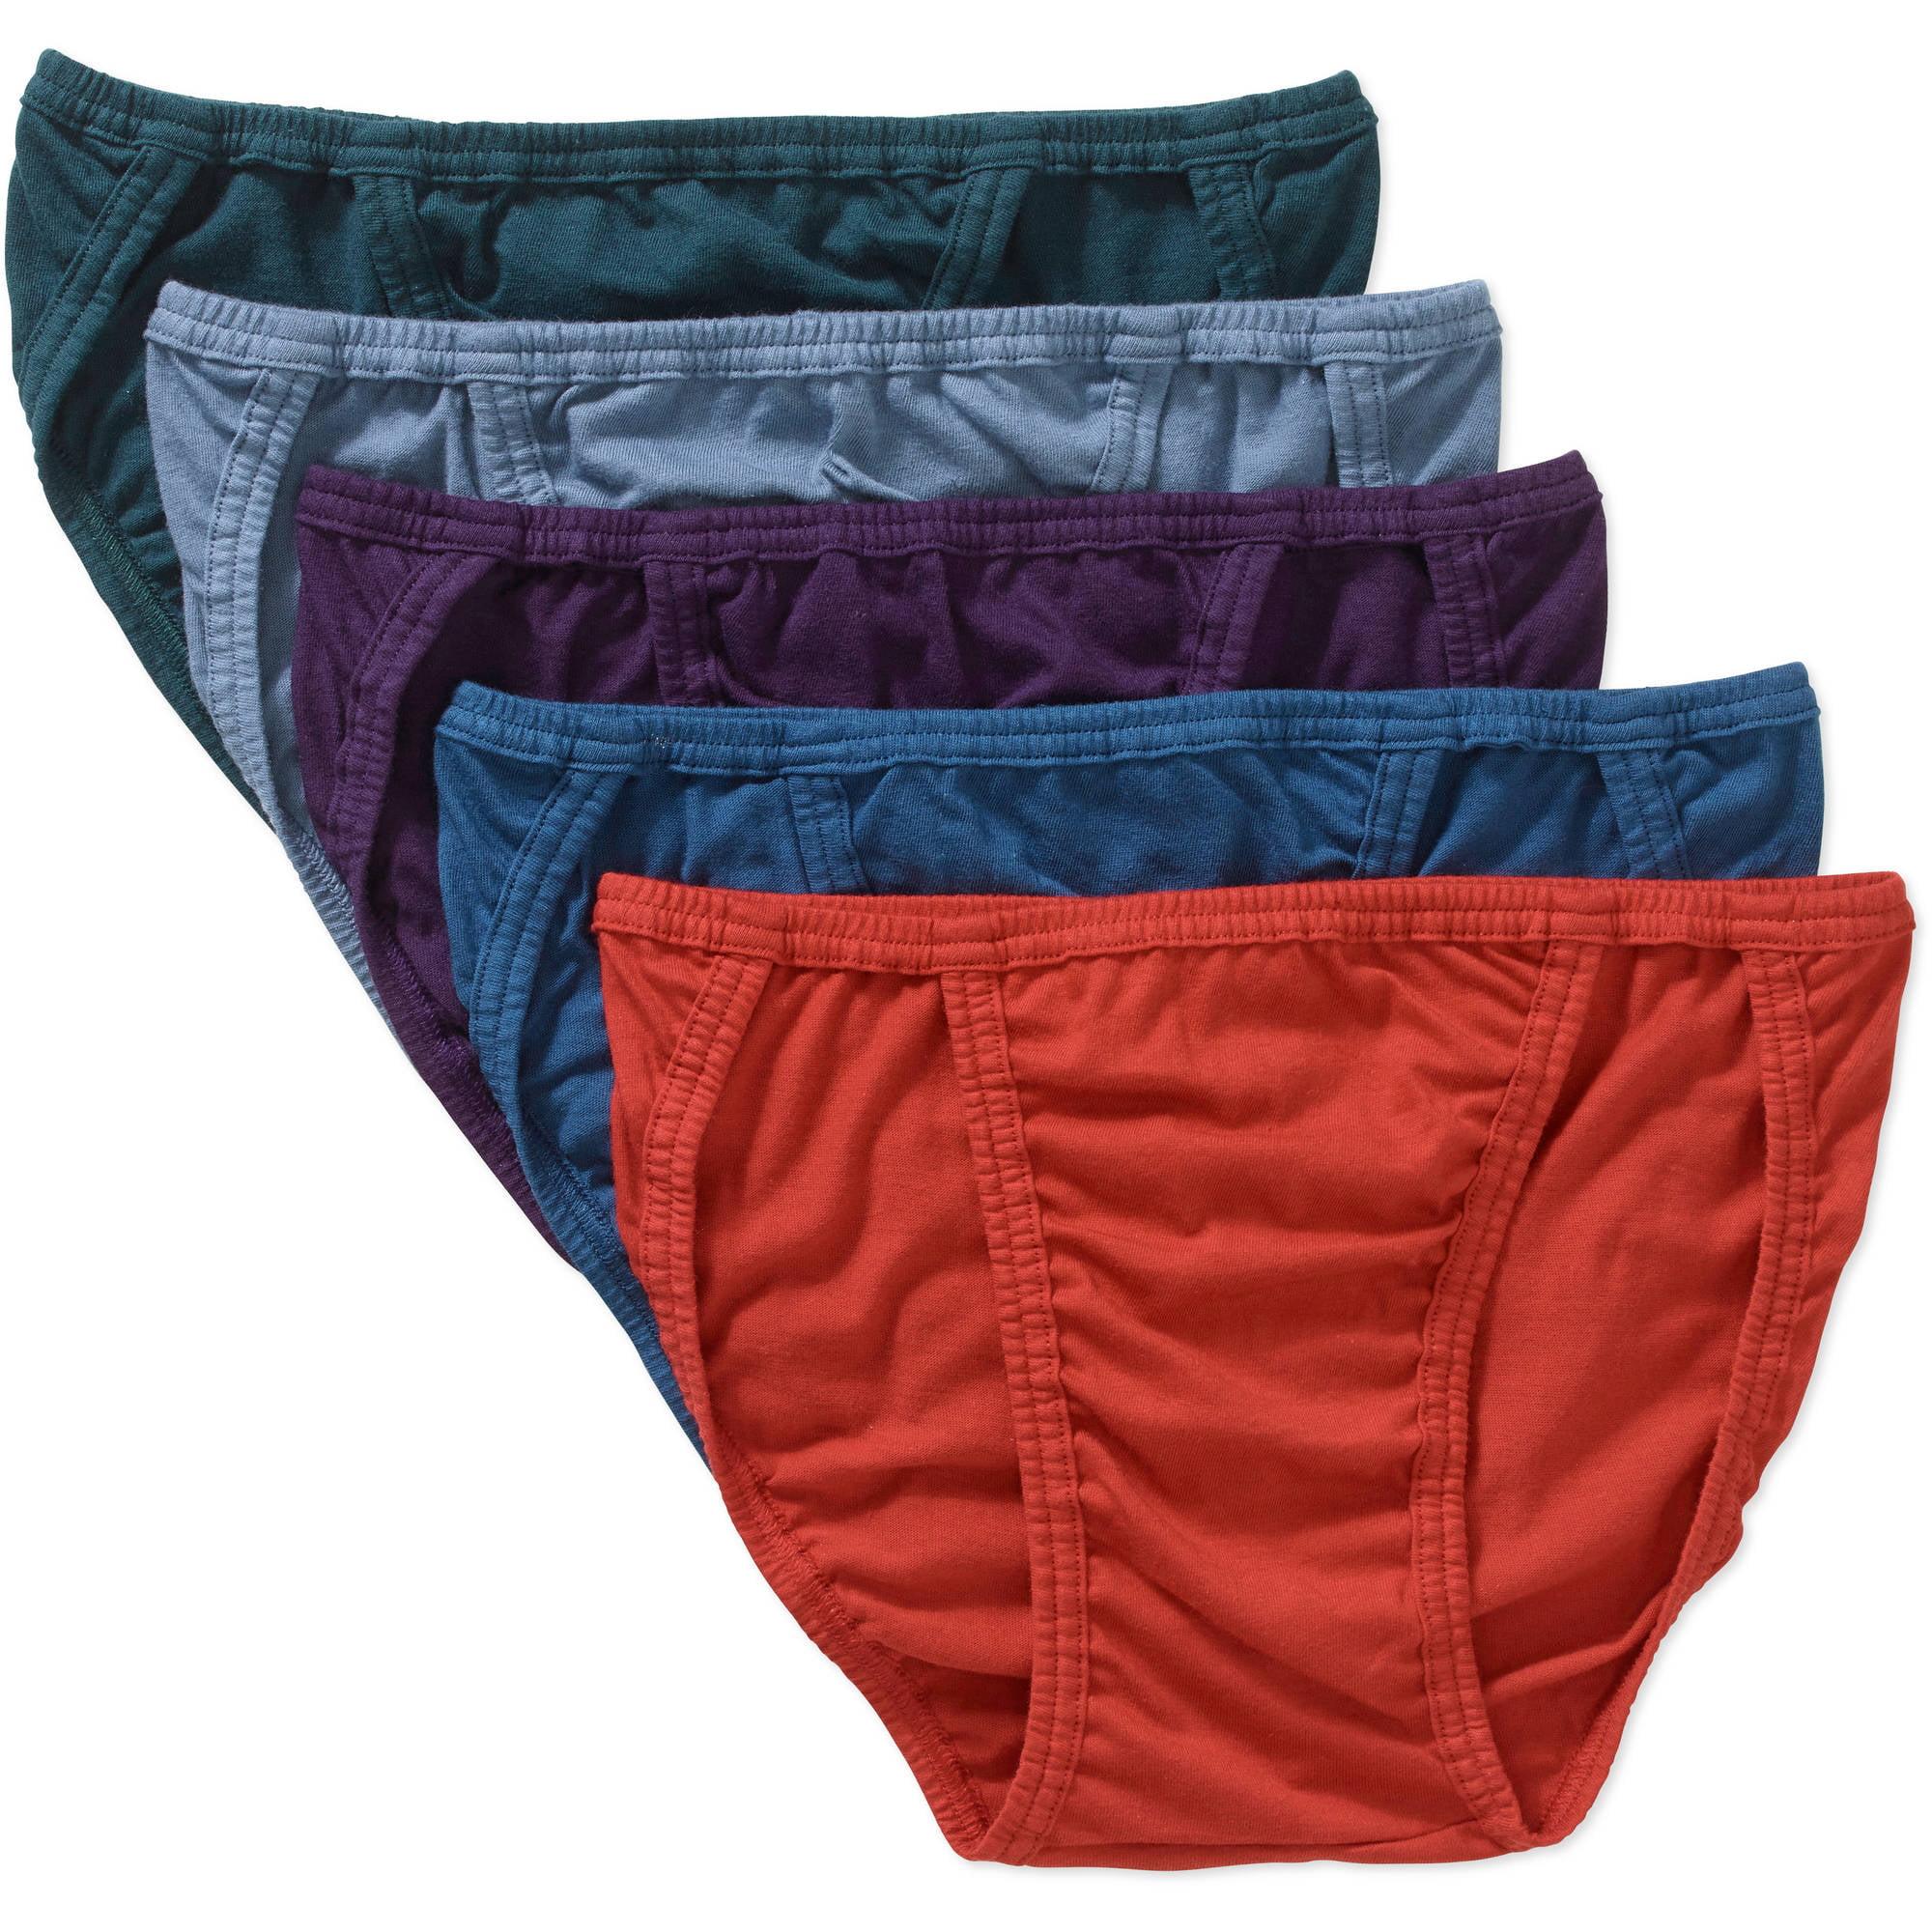 Life by Jockey Assorted Cotton String Bikini, 5 pack